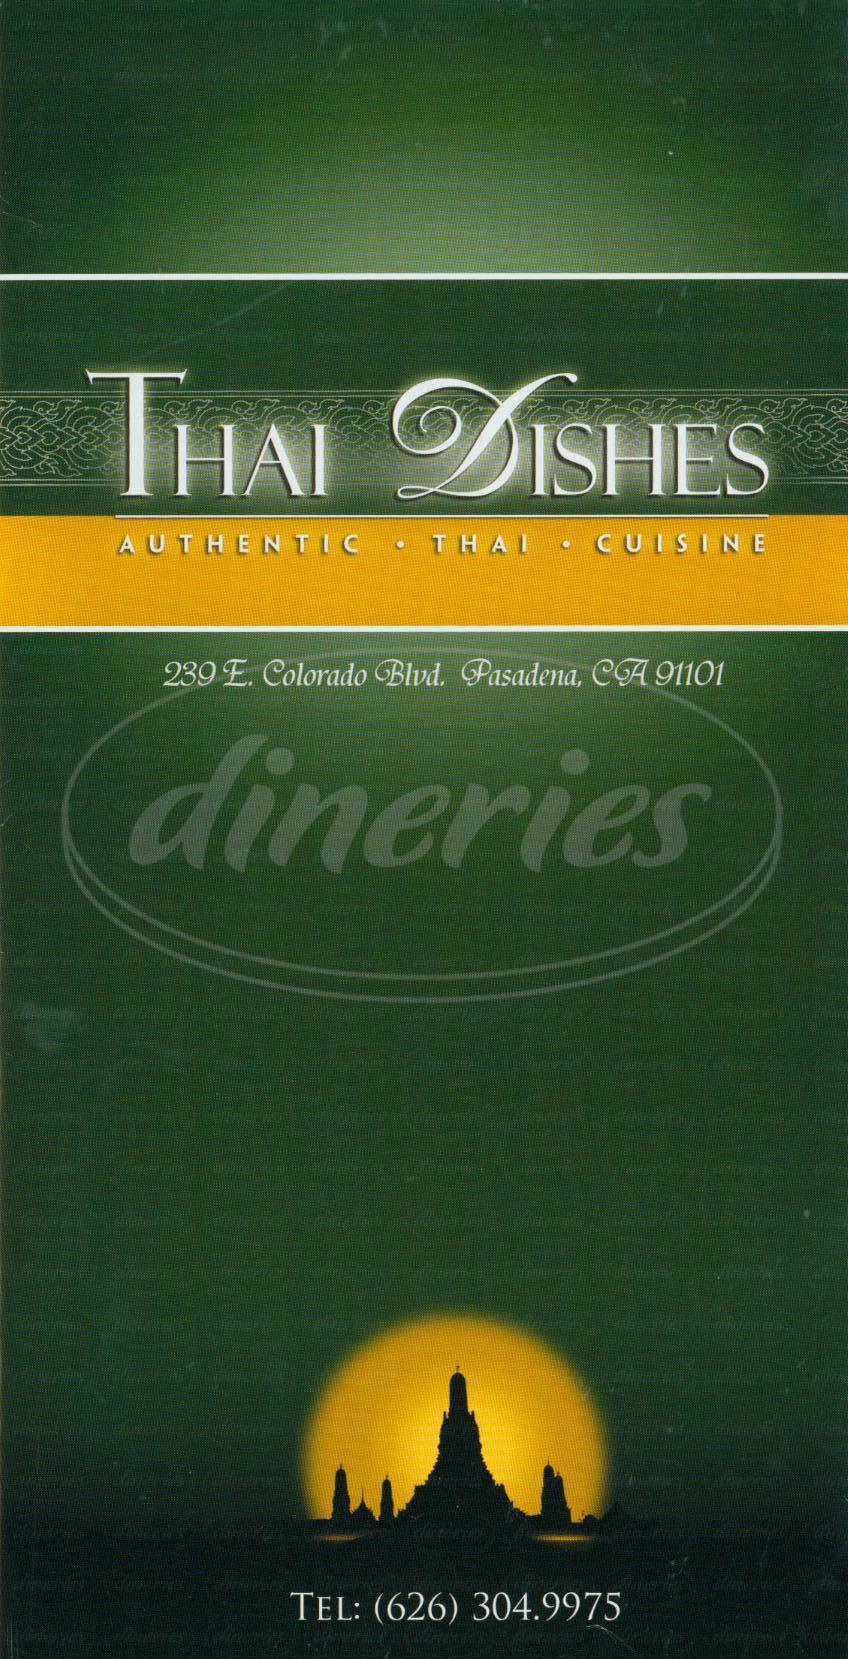 menu for Thai Dishes Restaurant